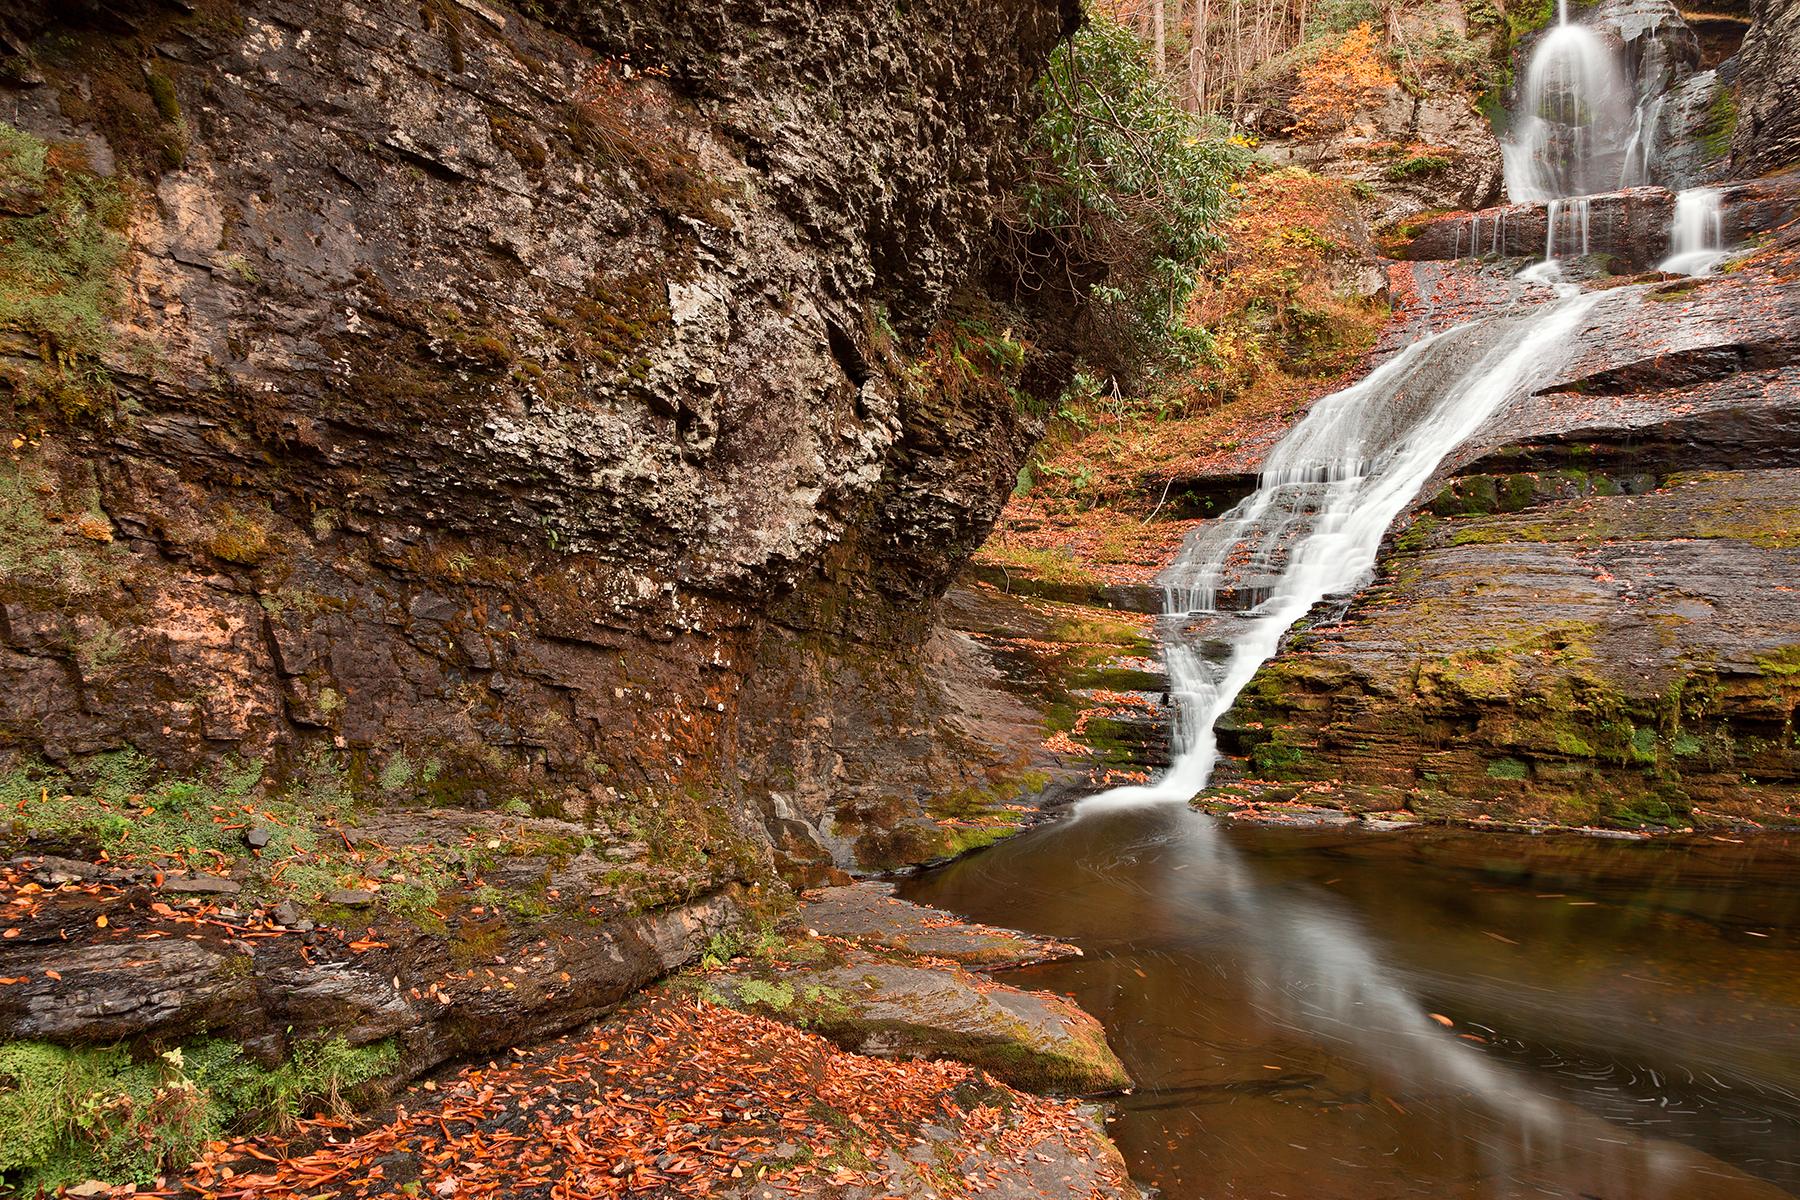 Dingmans Autumn Falls, America, Pour, Scene, Rugged, HQ Photo